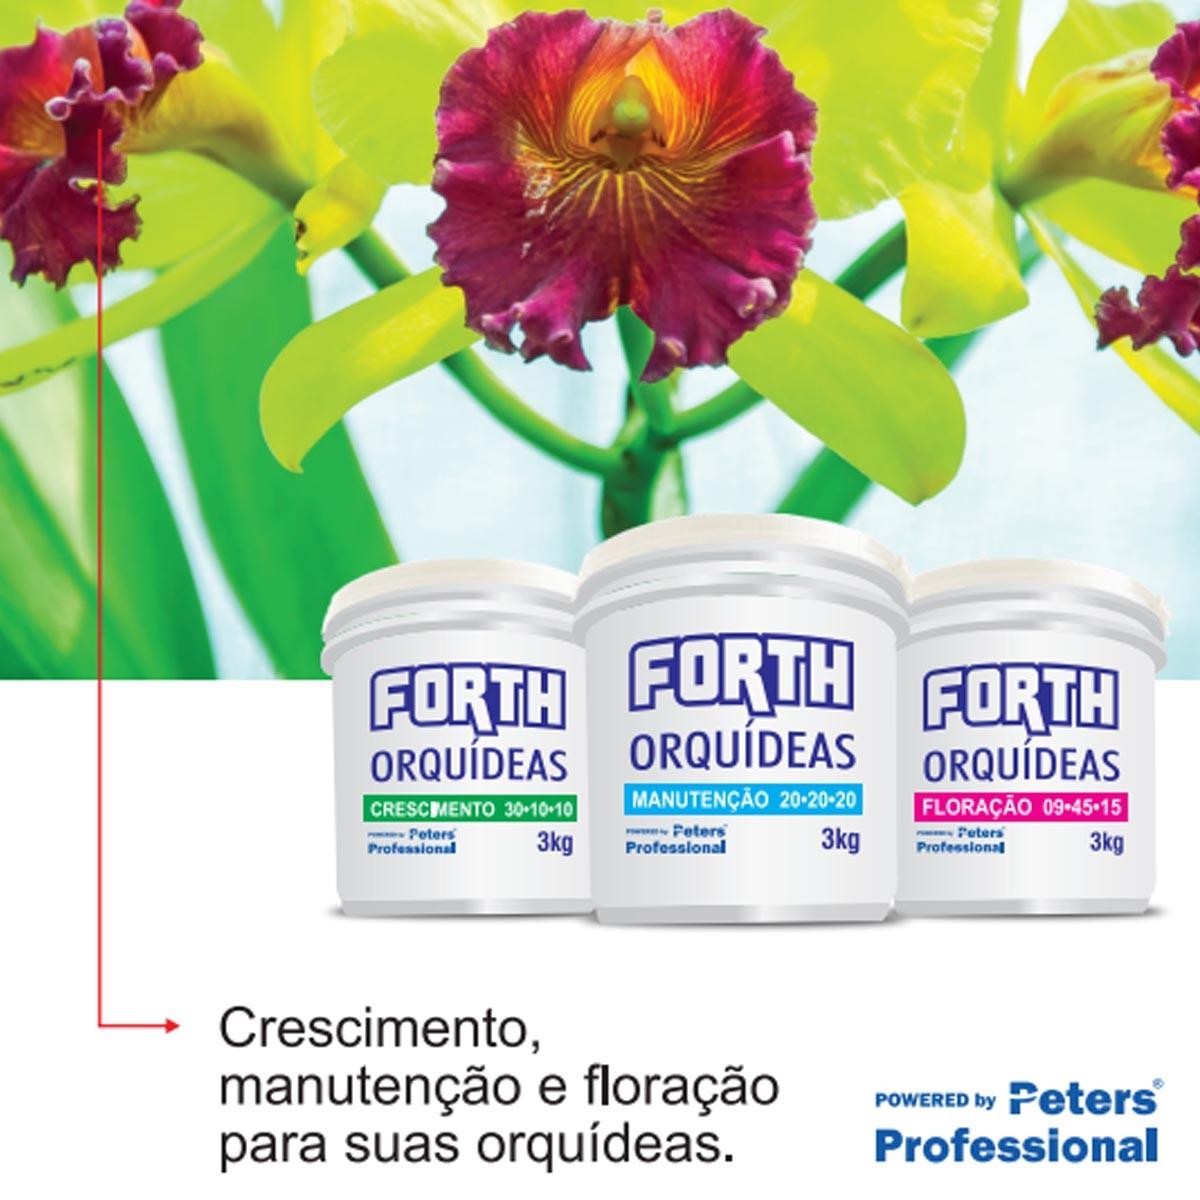 Adubo Fertilizante Forth Orquídea Manutenção 400g